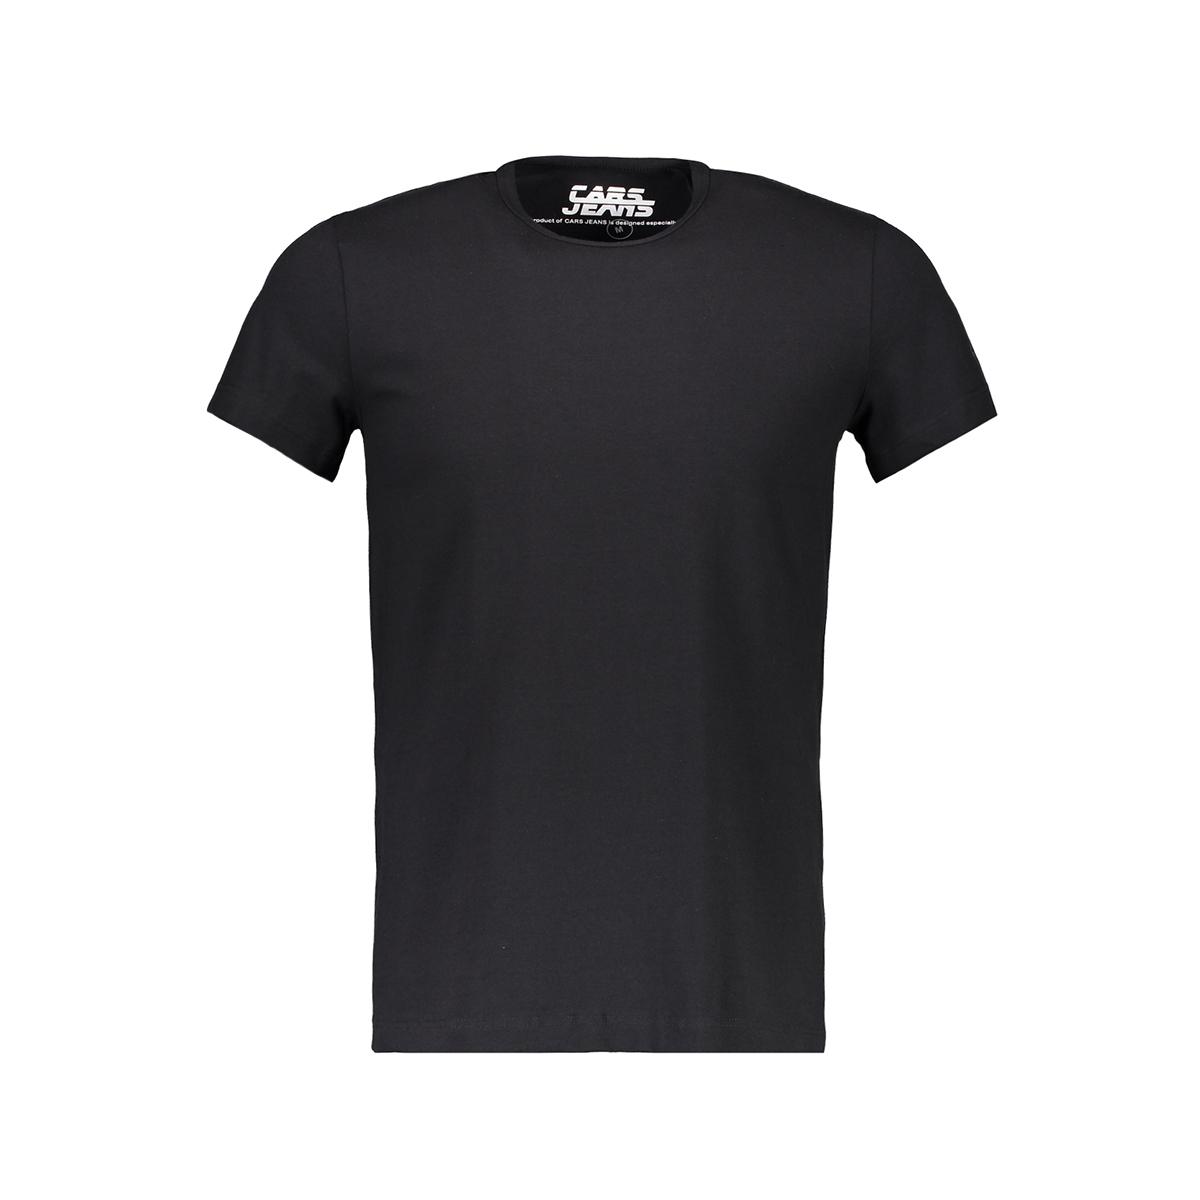 rick 61332 cars t-shirt 01 black